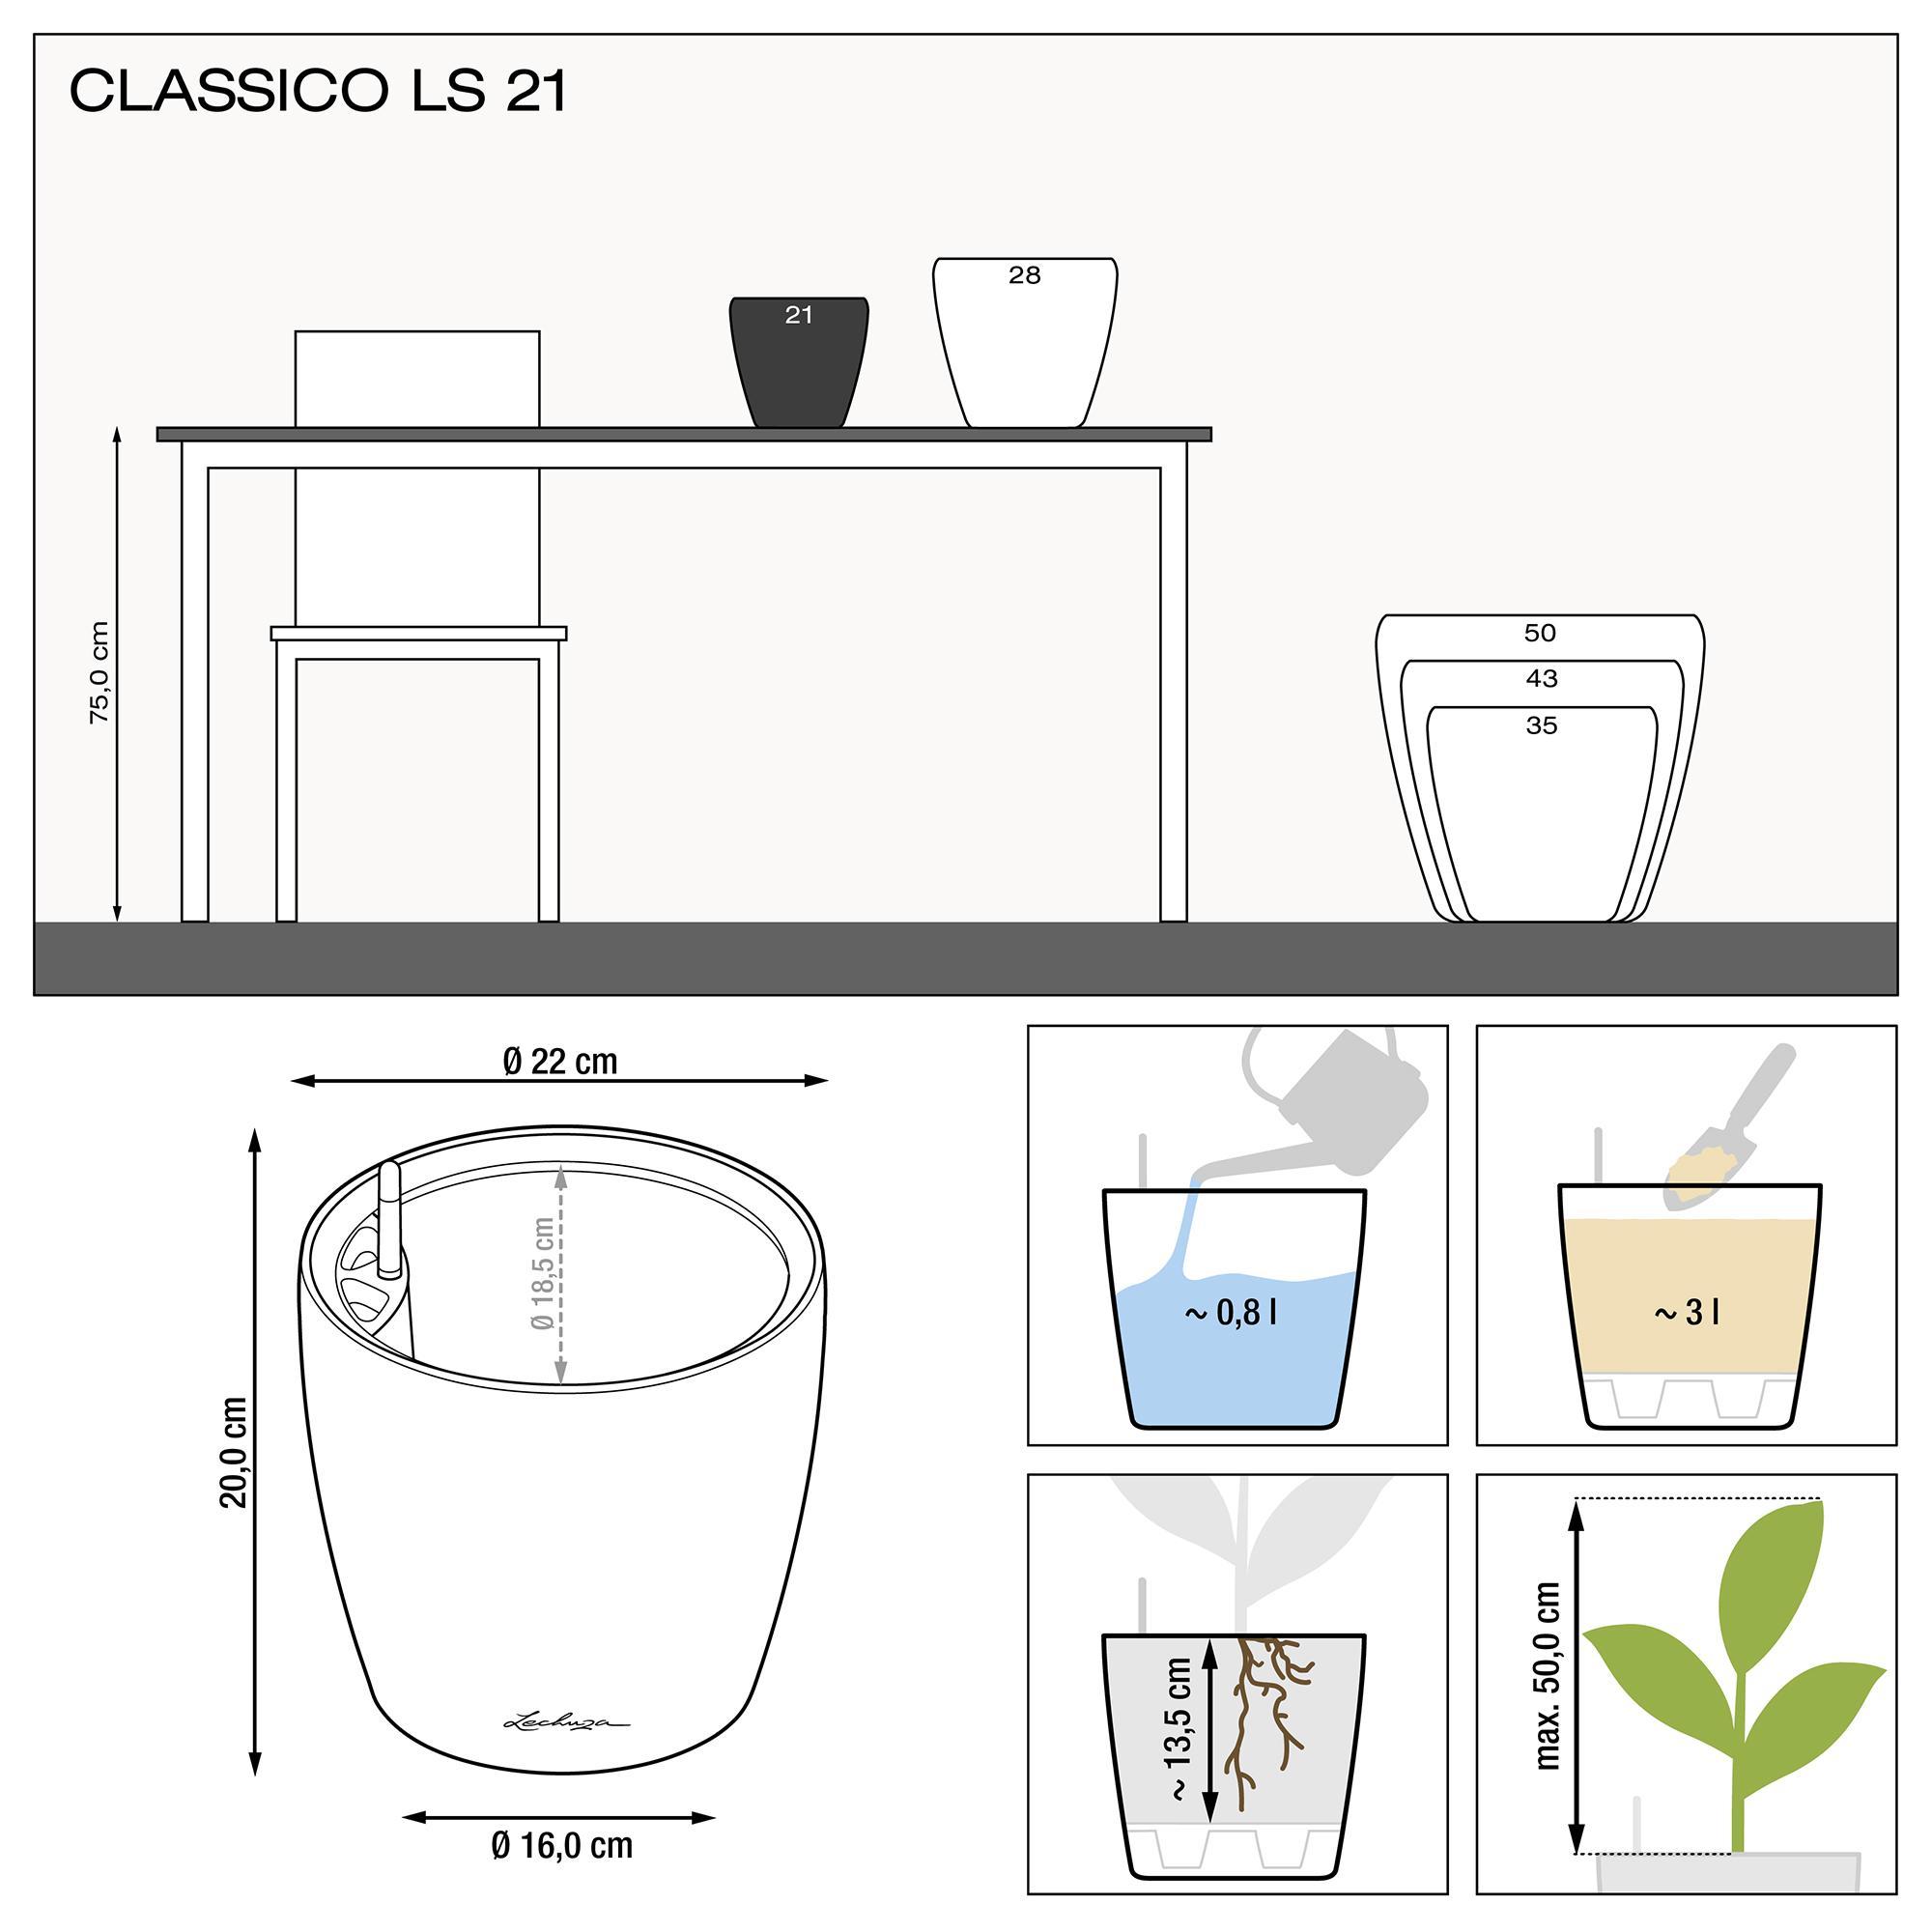 CLASSICO LS 21 weiß hochglanz - Bild 3